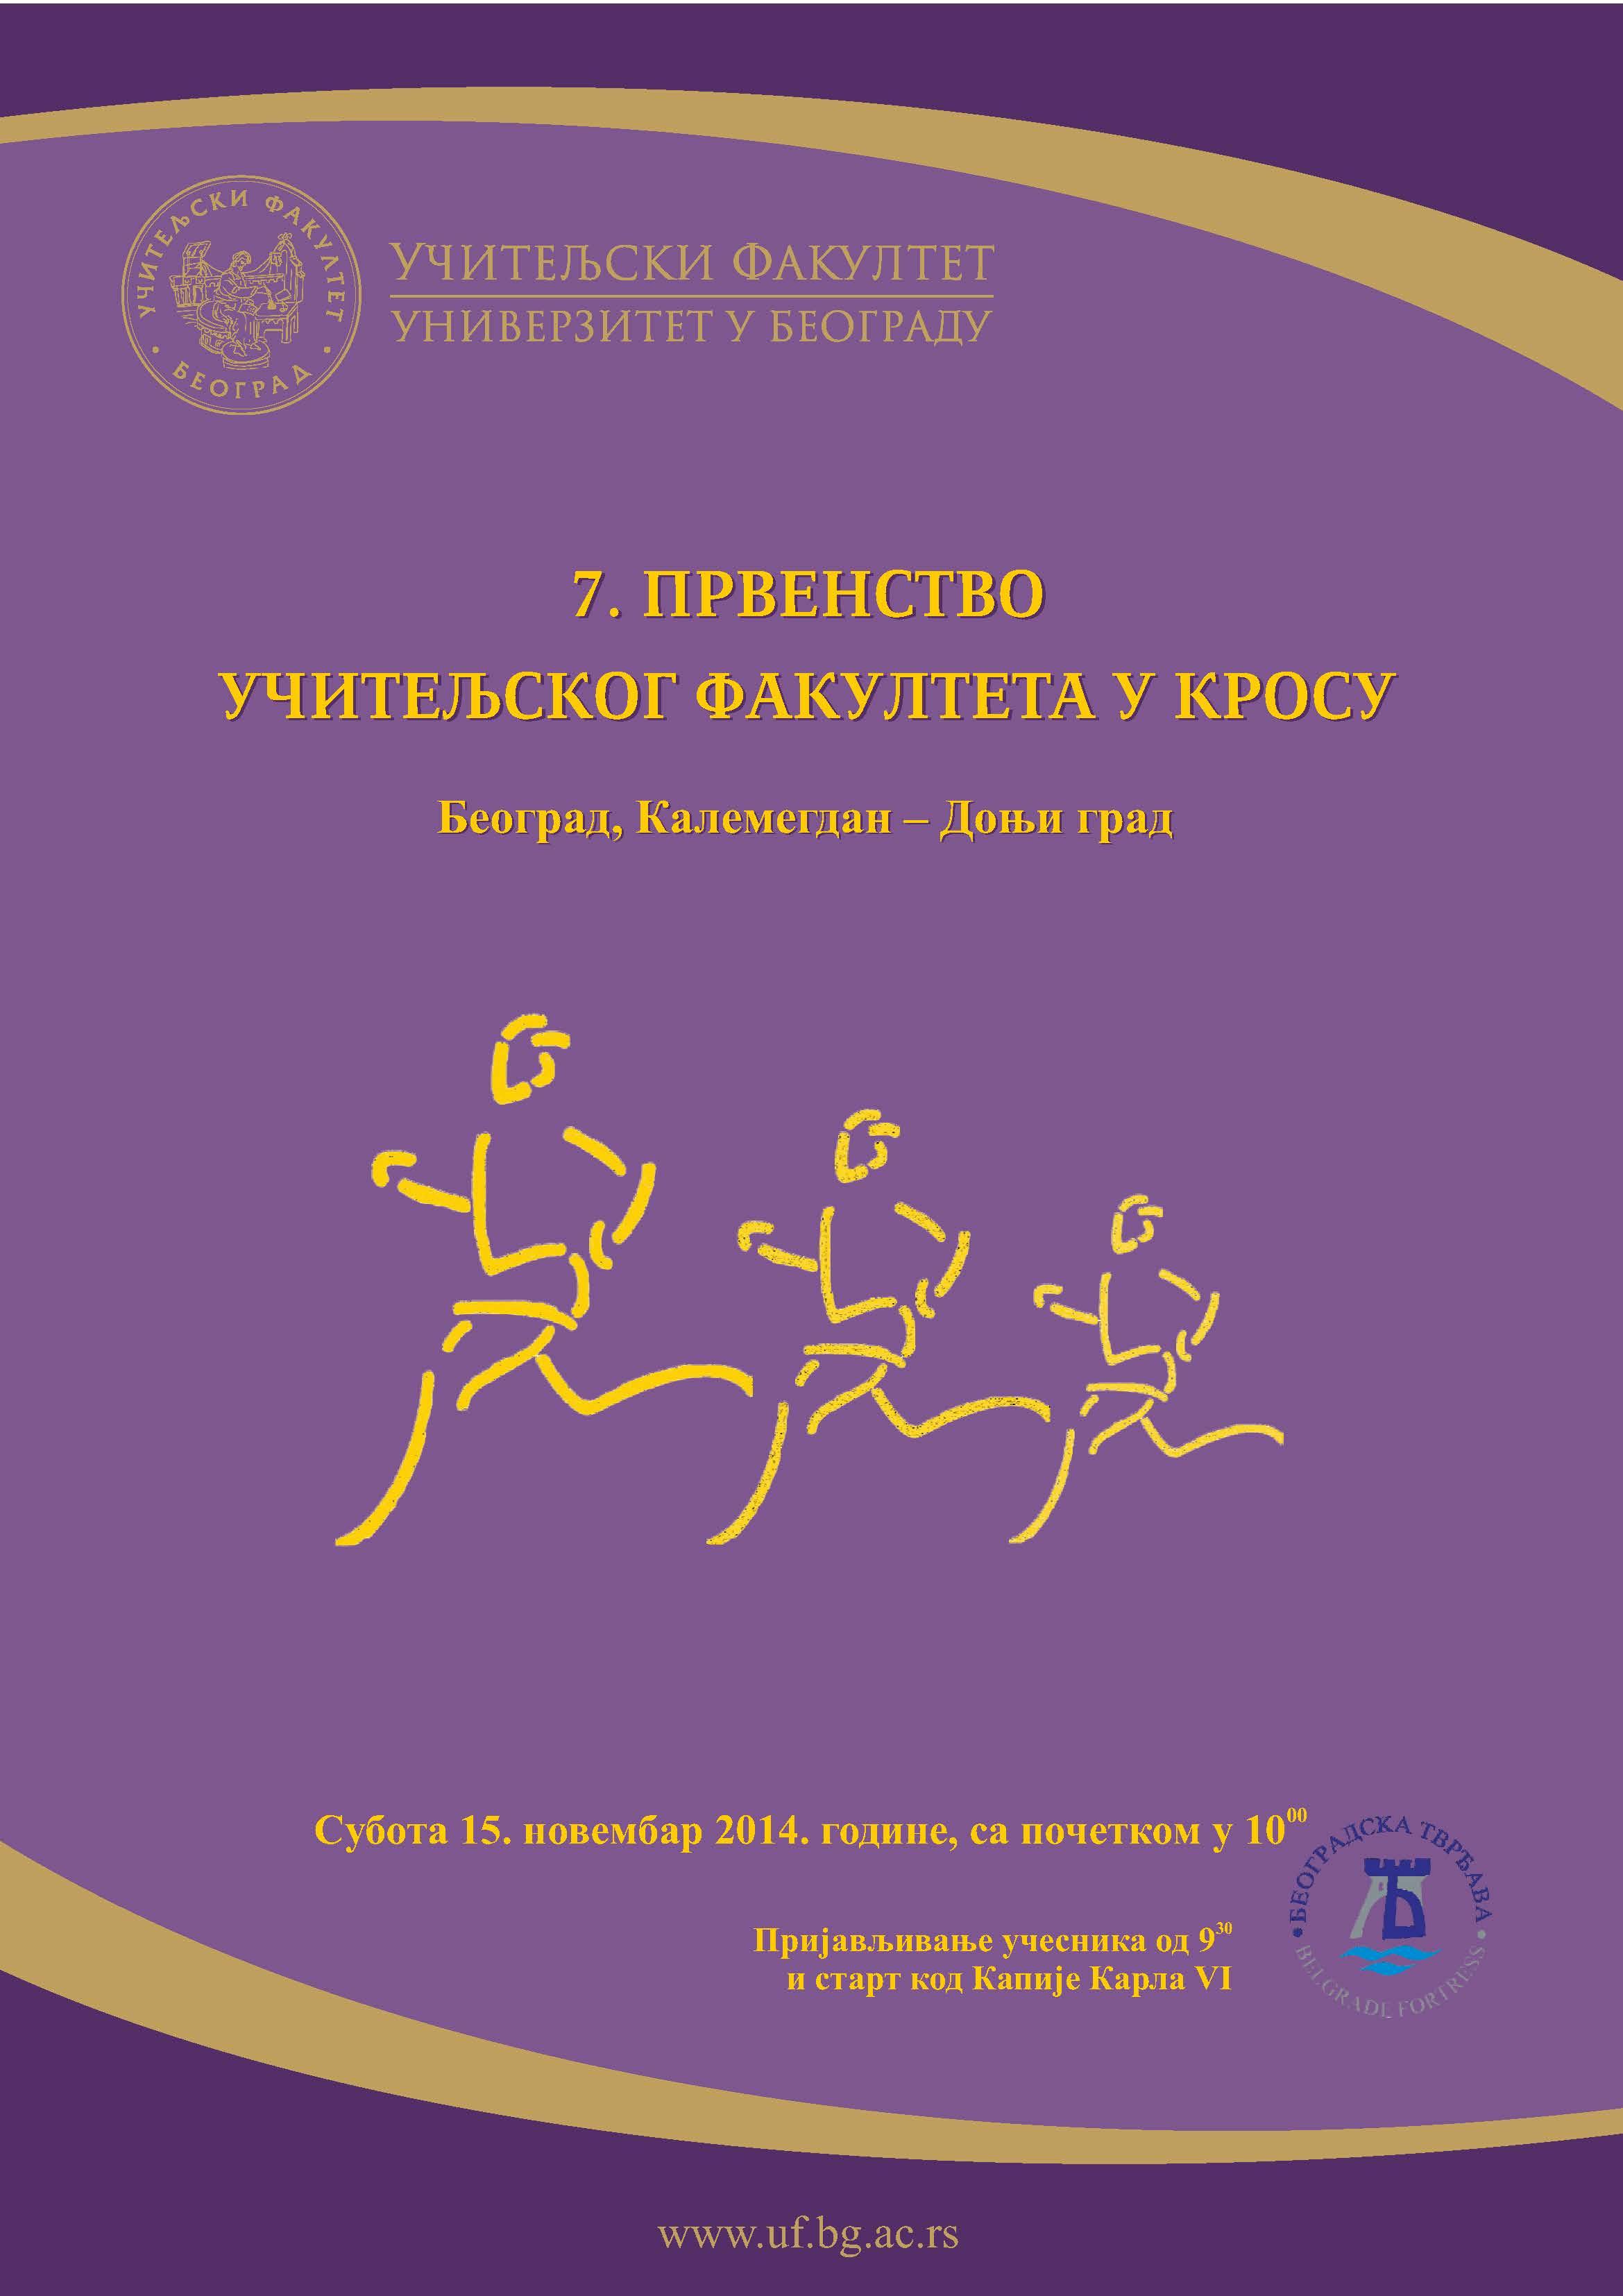 7. kros poster